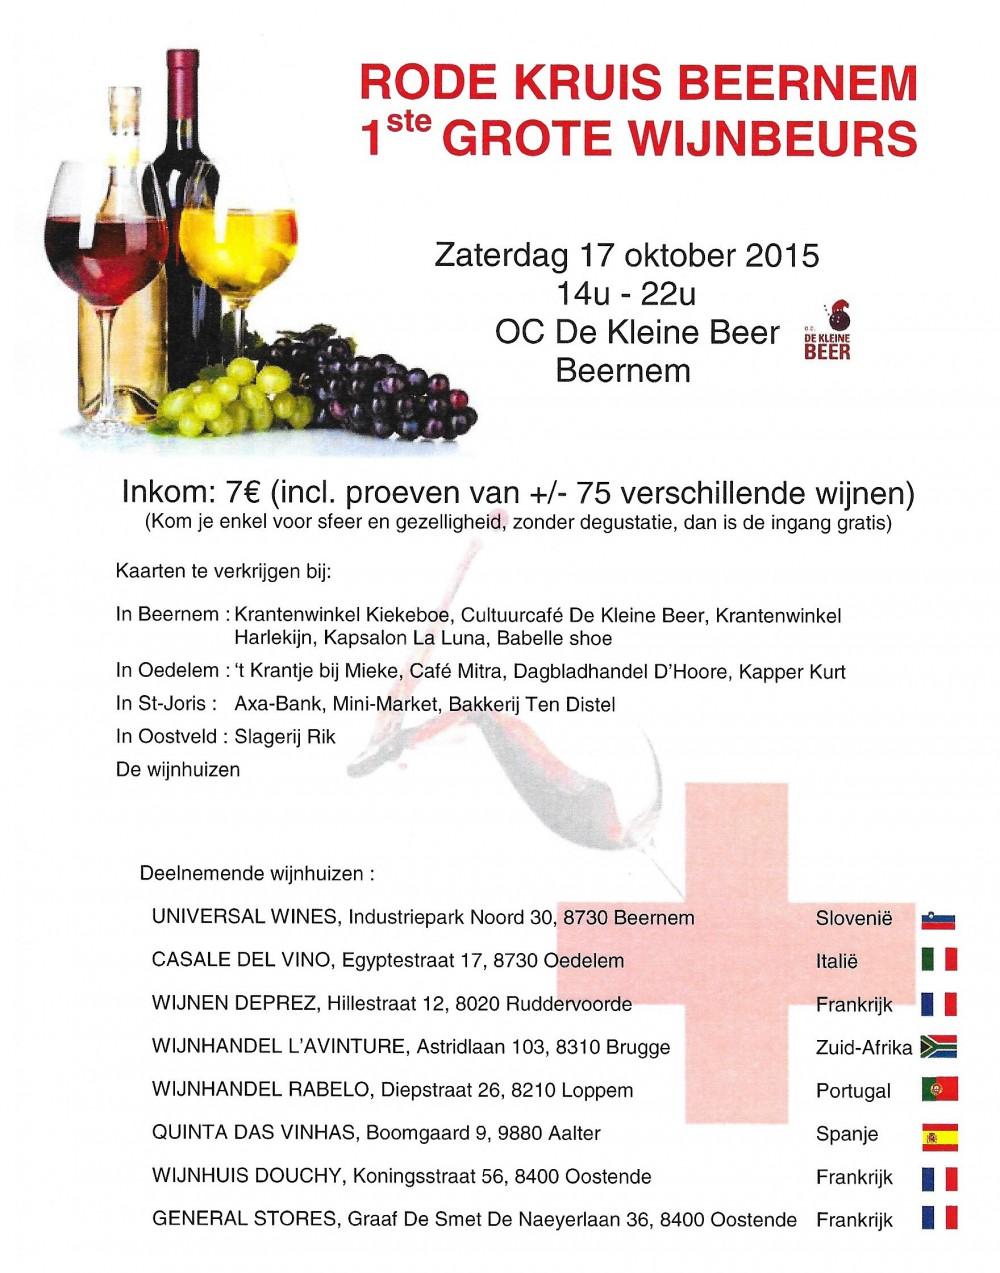 1e Grote Wijnbeurs Rode Kruis Beernem